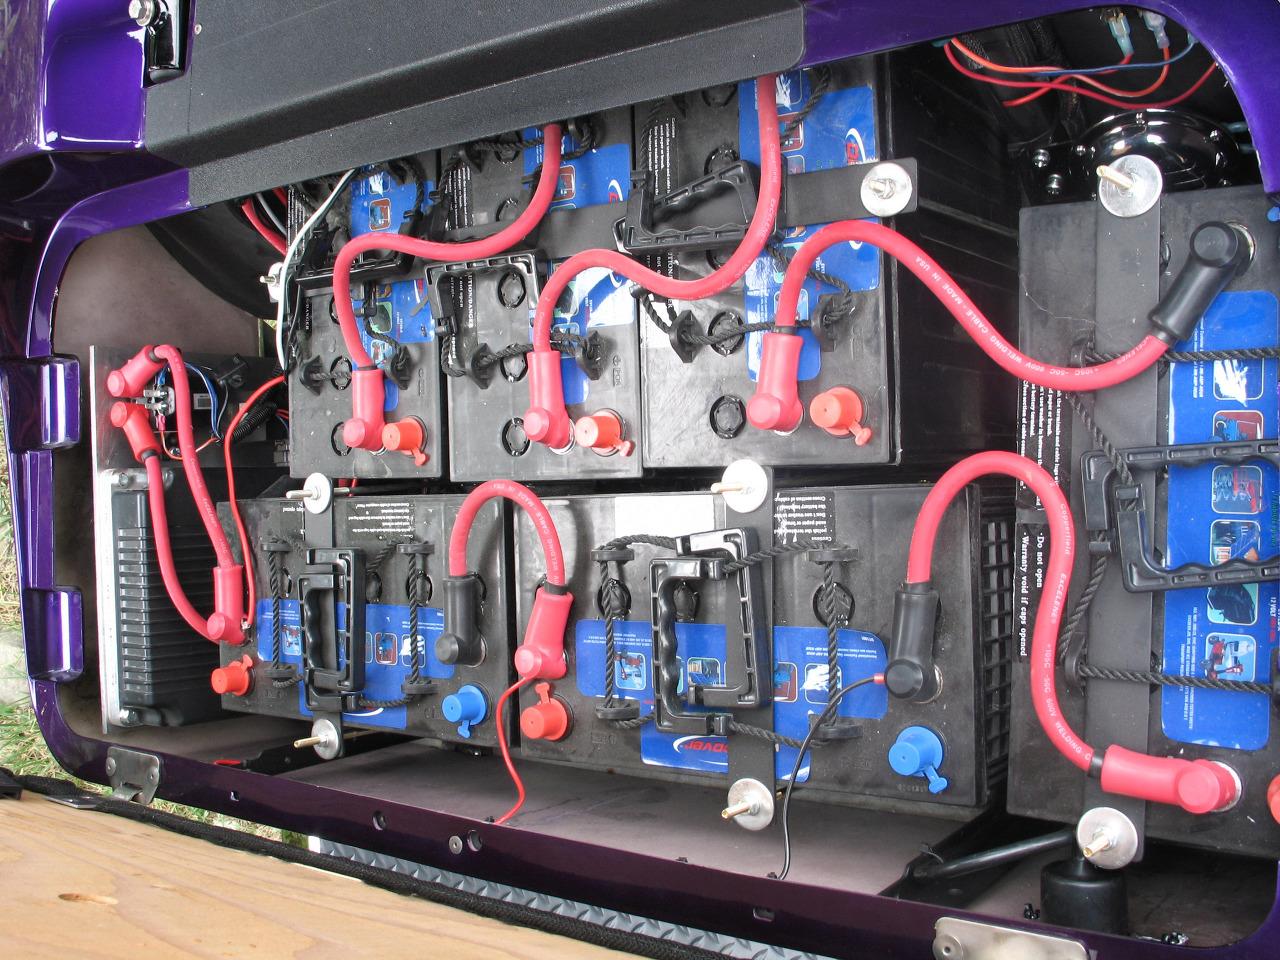 Melex Golf Cart Wiring Diagram Batteries - Automotive Diagrams Design  wires-habit - wires-habit.radioe.itRadio e